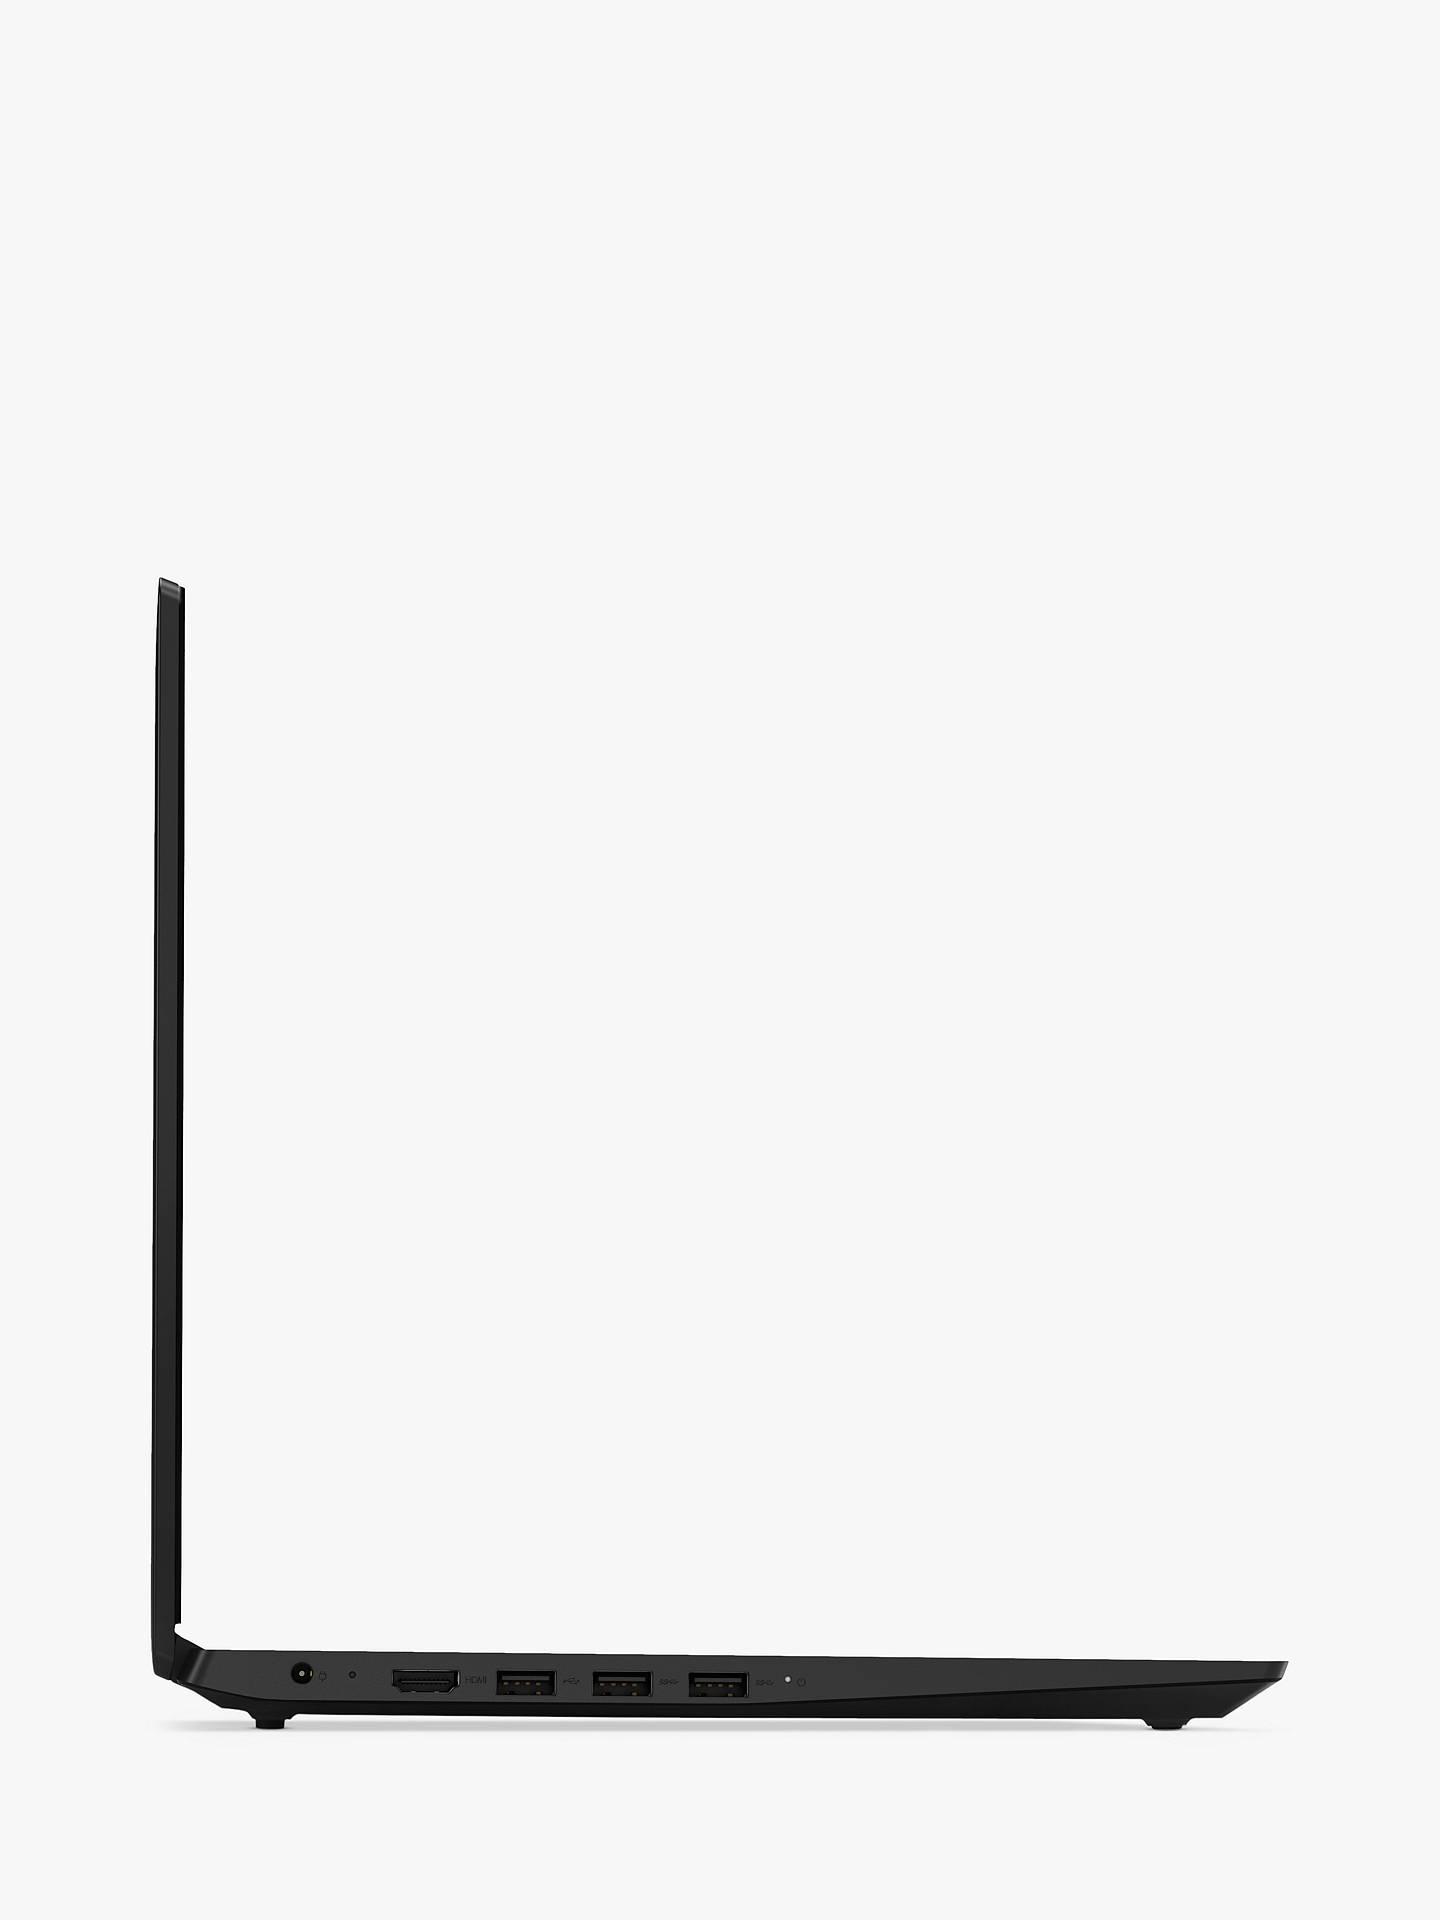 Lenovo IdeaPad S145-14IWL Laptop, Intel Pentium Gold 5405U